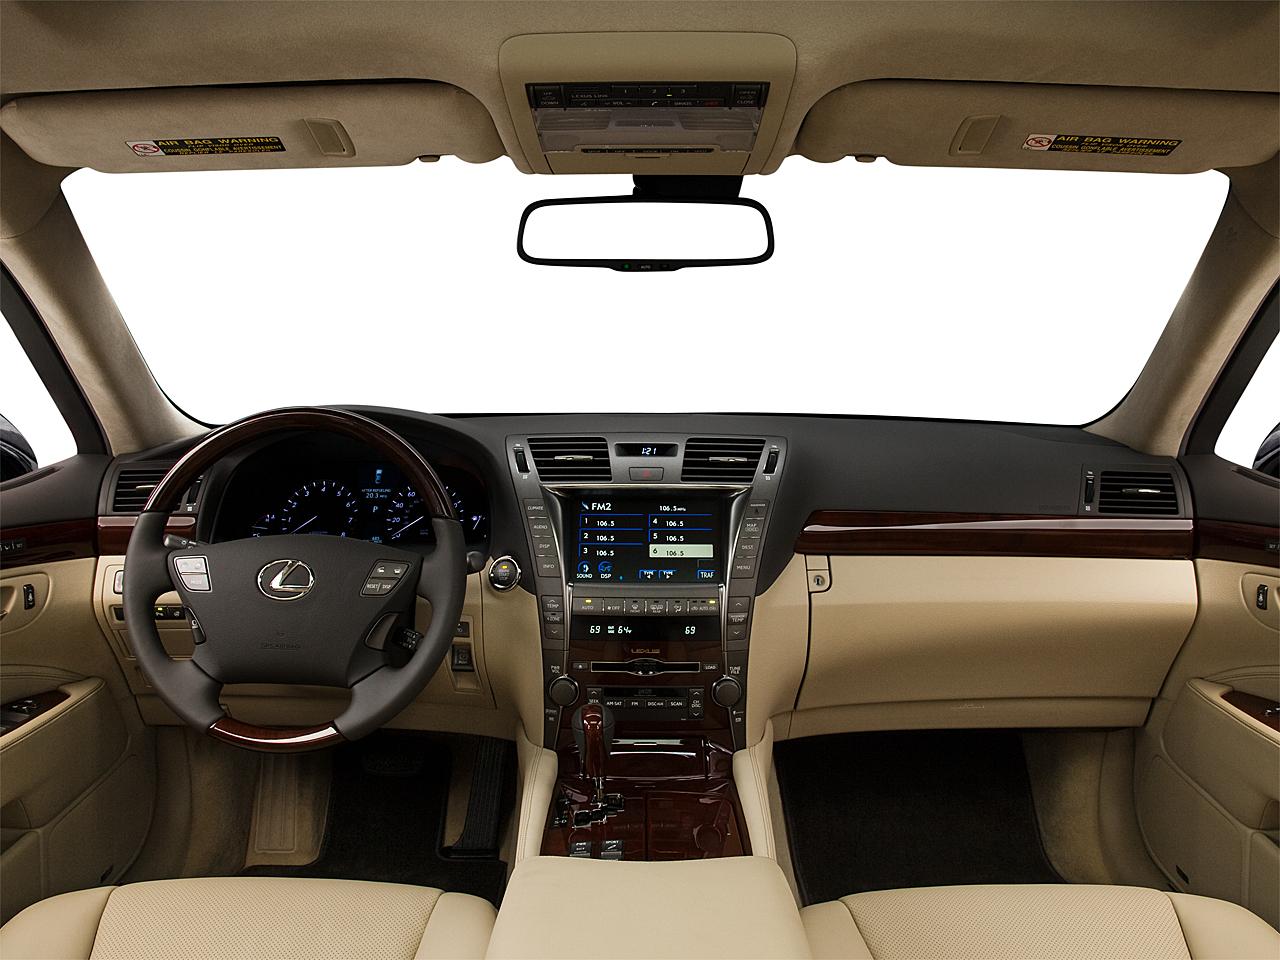 https://www.groovecar.com/media/stock/images/stills/2009/lexus/ls-460/4dr-sedan/2009-lexus-ls-460-4dr-sedan-059-large.jpg